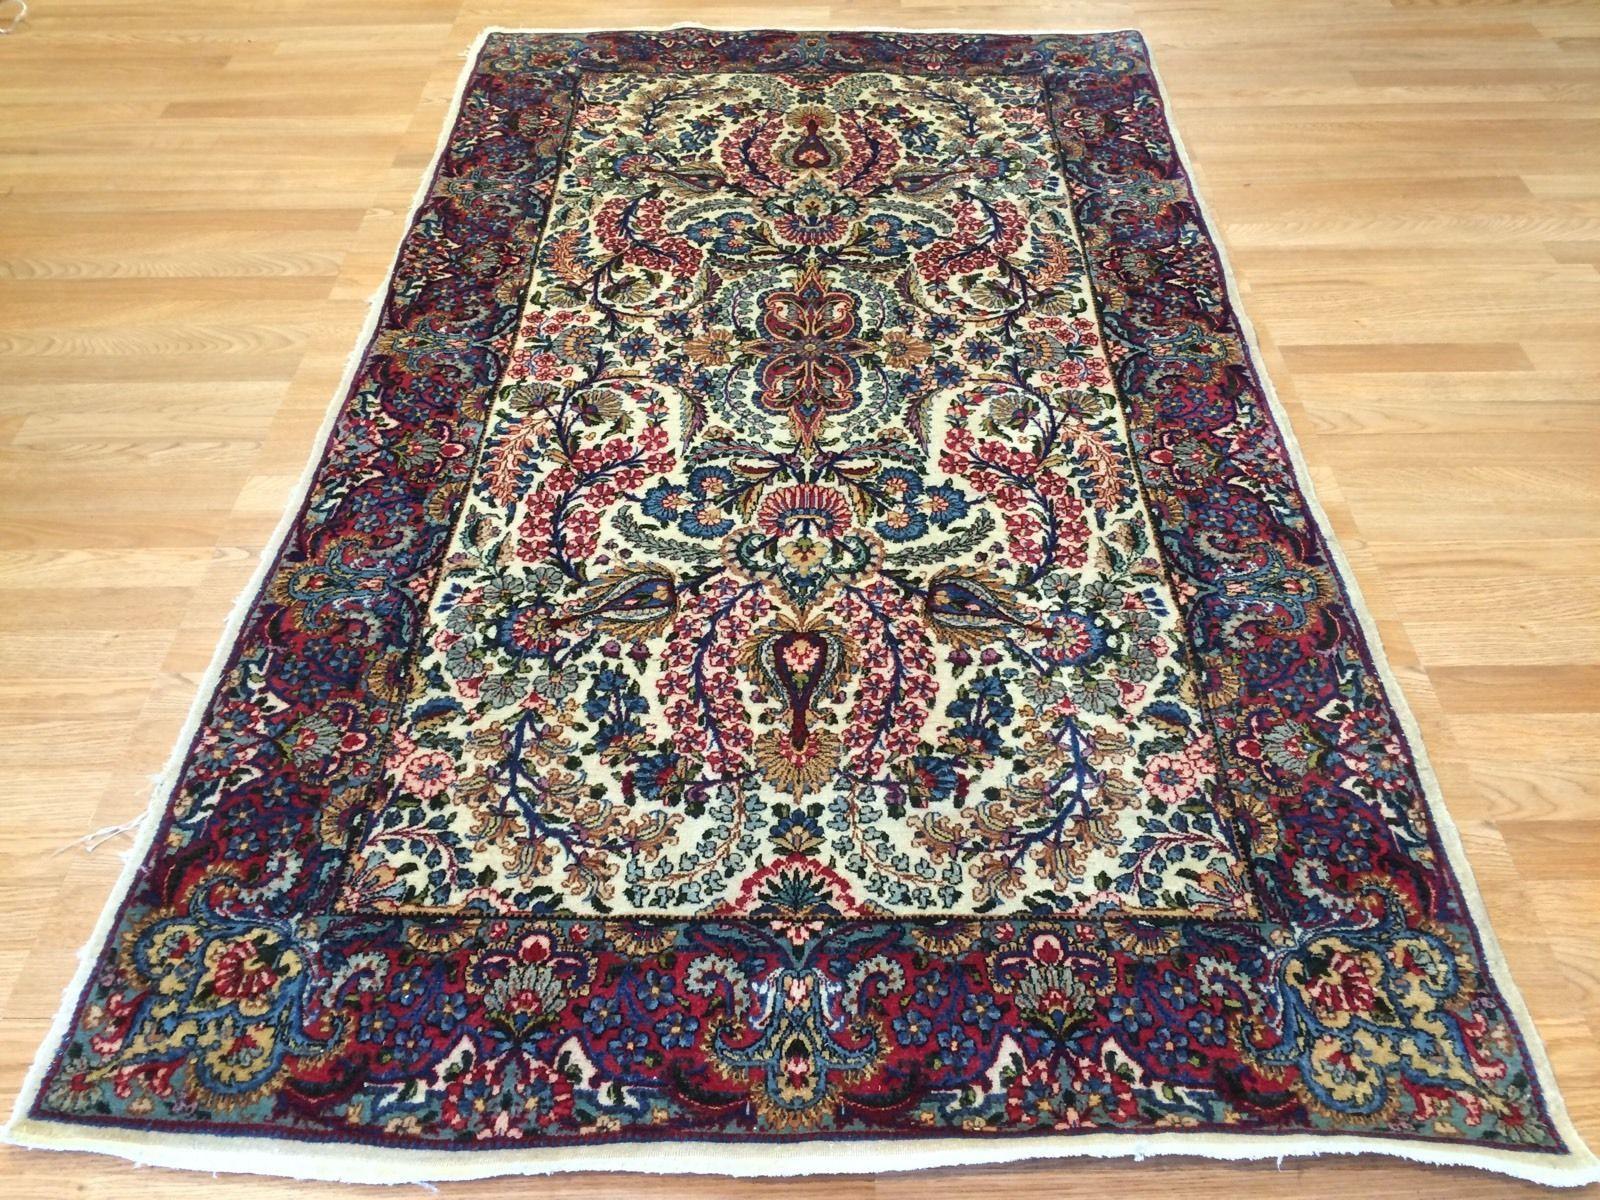 Lavish Lavar Kerman 1930s Antique Persian Rug Ravar Carpet Kerman Is An Ancient City With An Incredible History Goin Antique Persian Rug Persian Rug Rugs